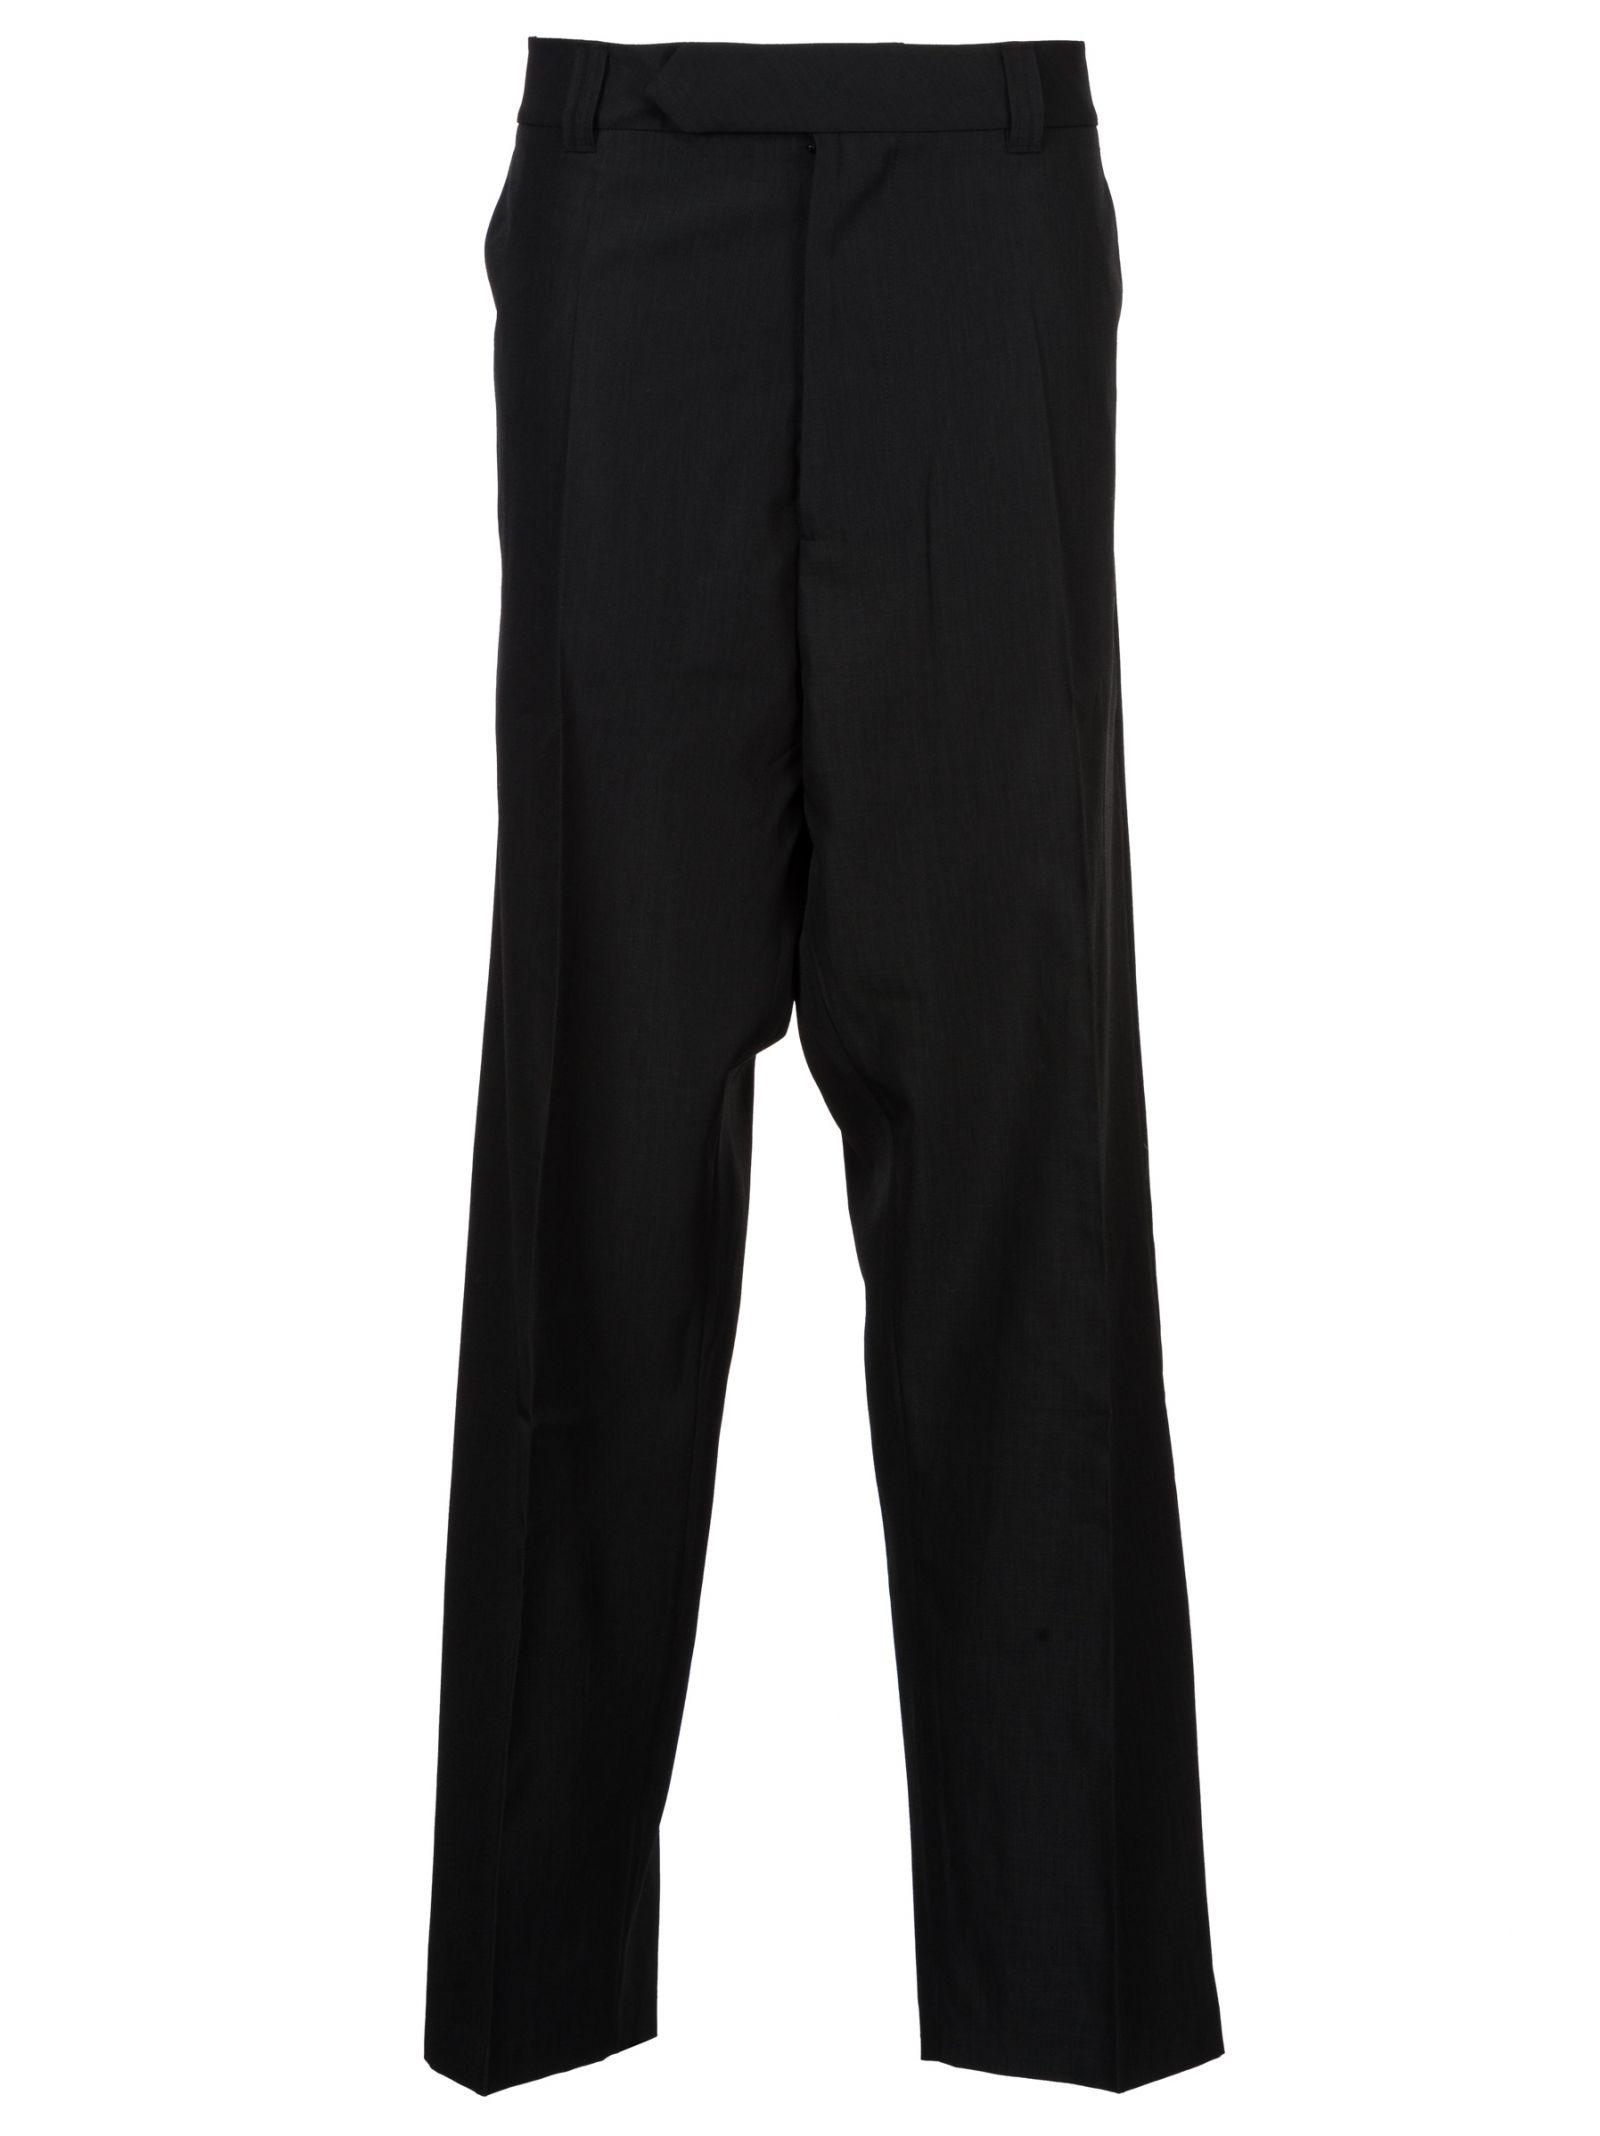 Vetements Baggy Pants - VETEMENTS - They 5